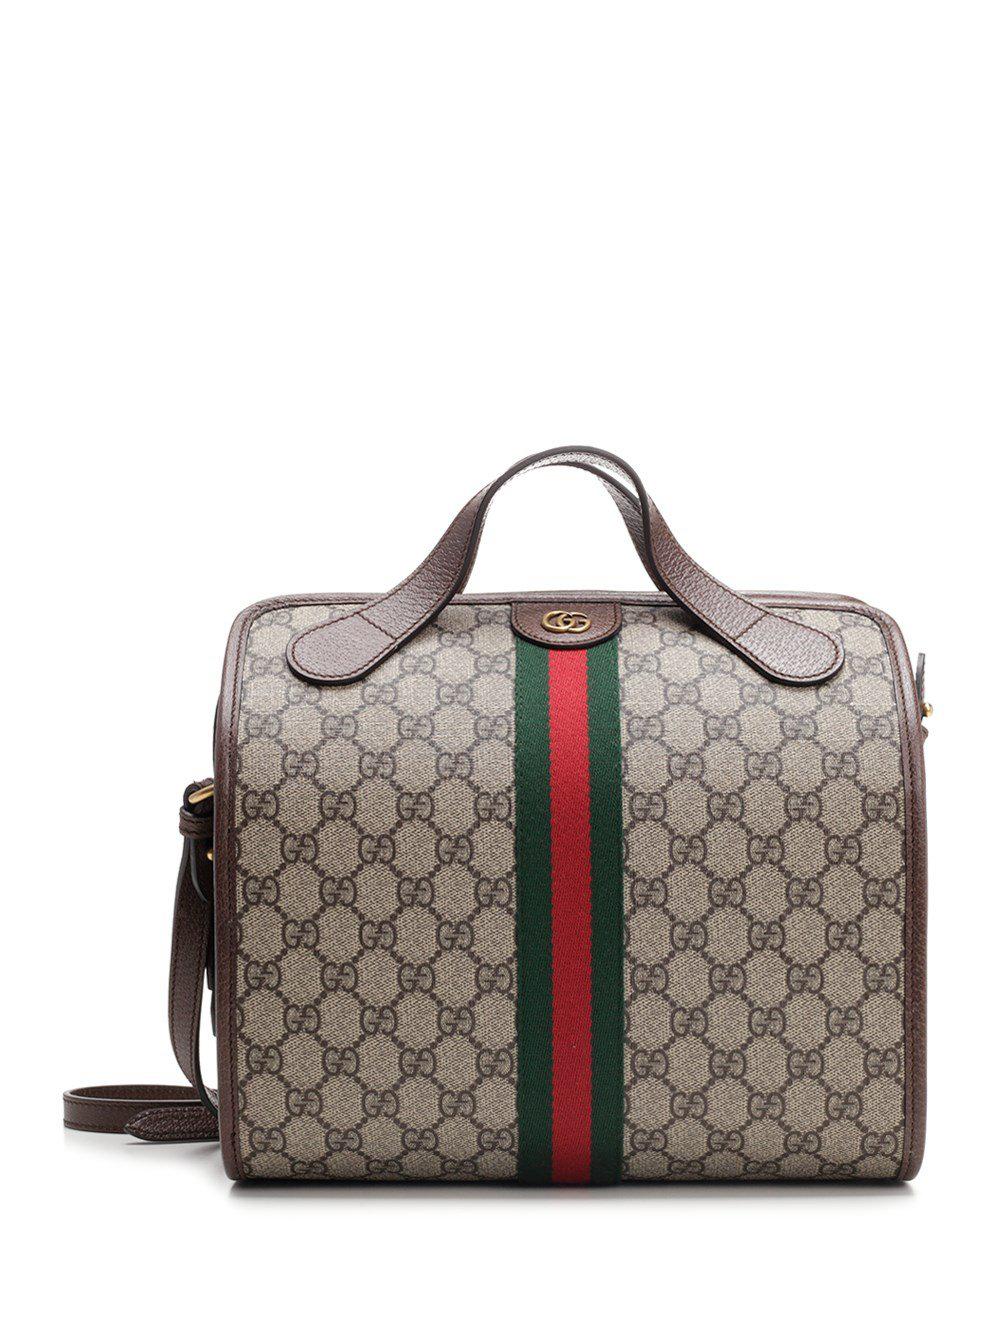 e4990d4d81d Gucci Gg Supreme Ophidia Mini Duffle Bag In Multi